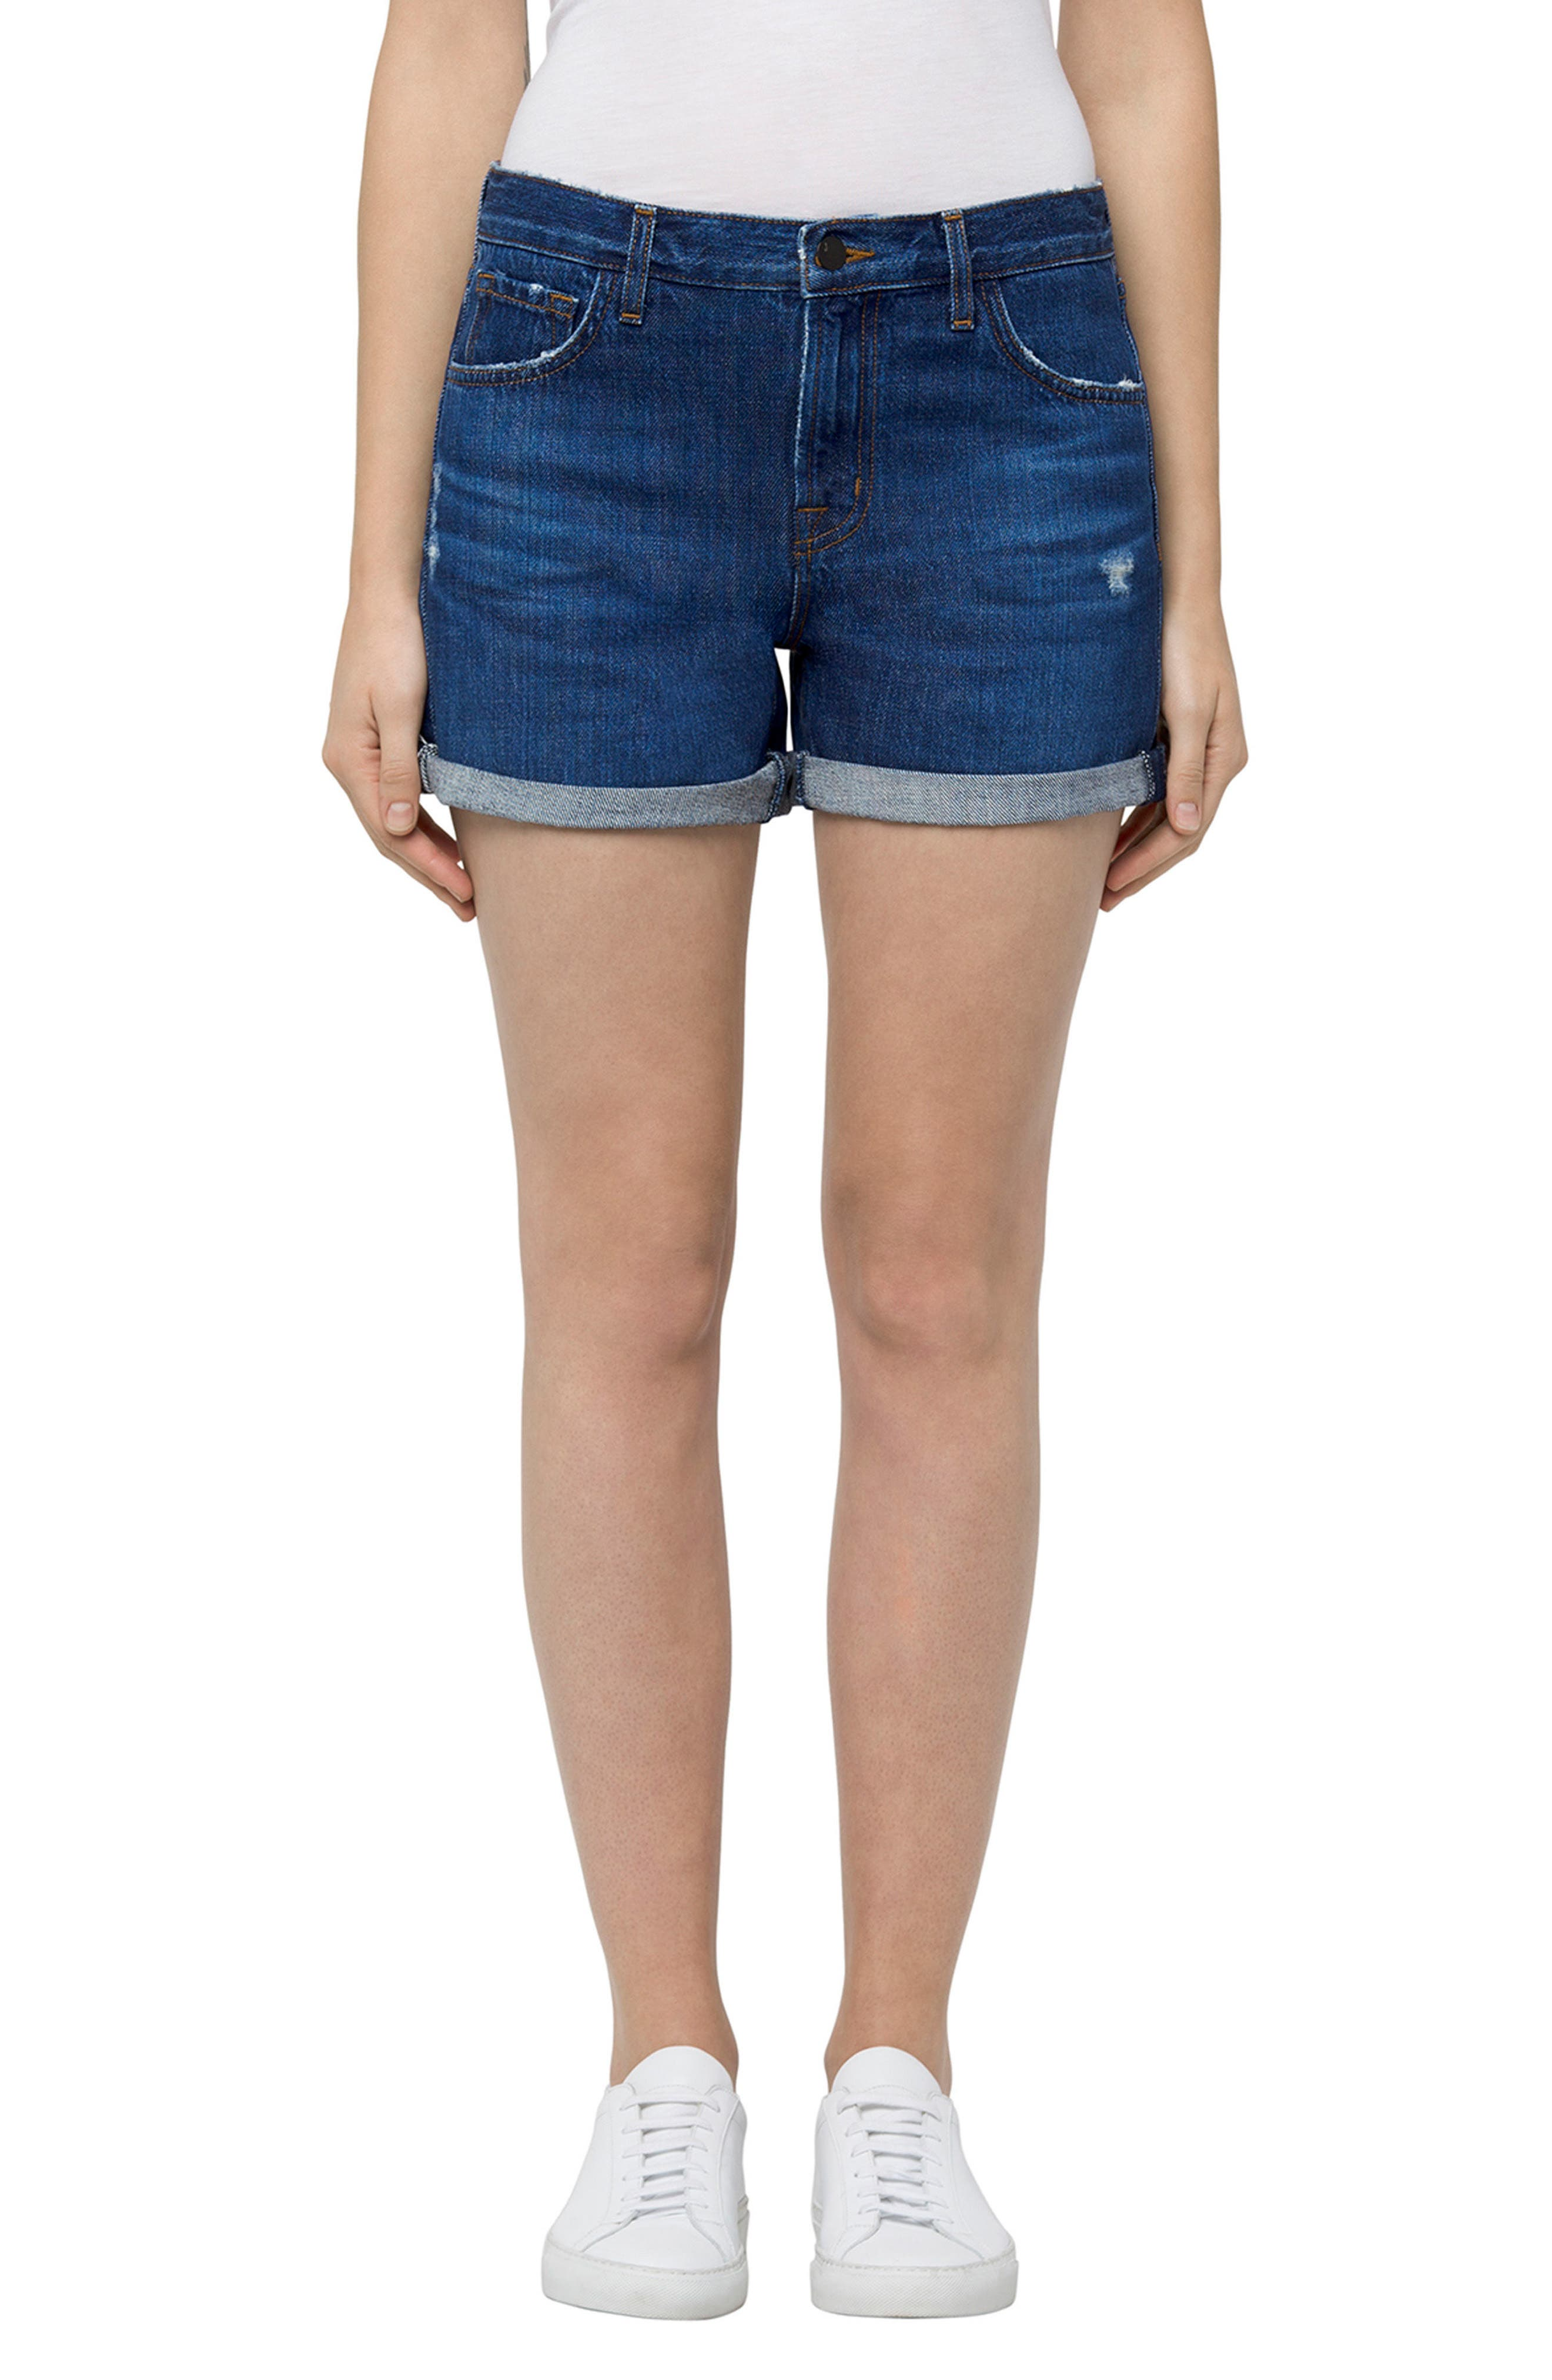 Johnny Denim Shorts,                         Main,                         color, Doubletake